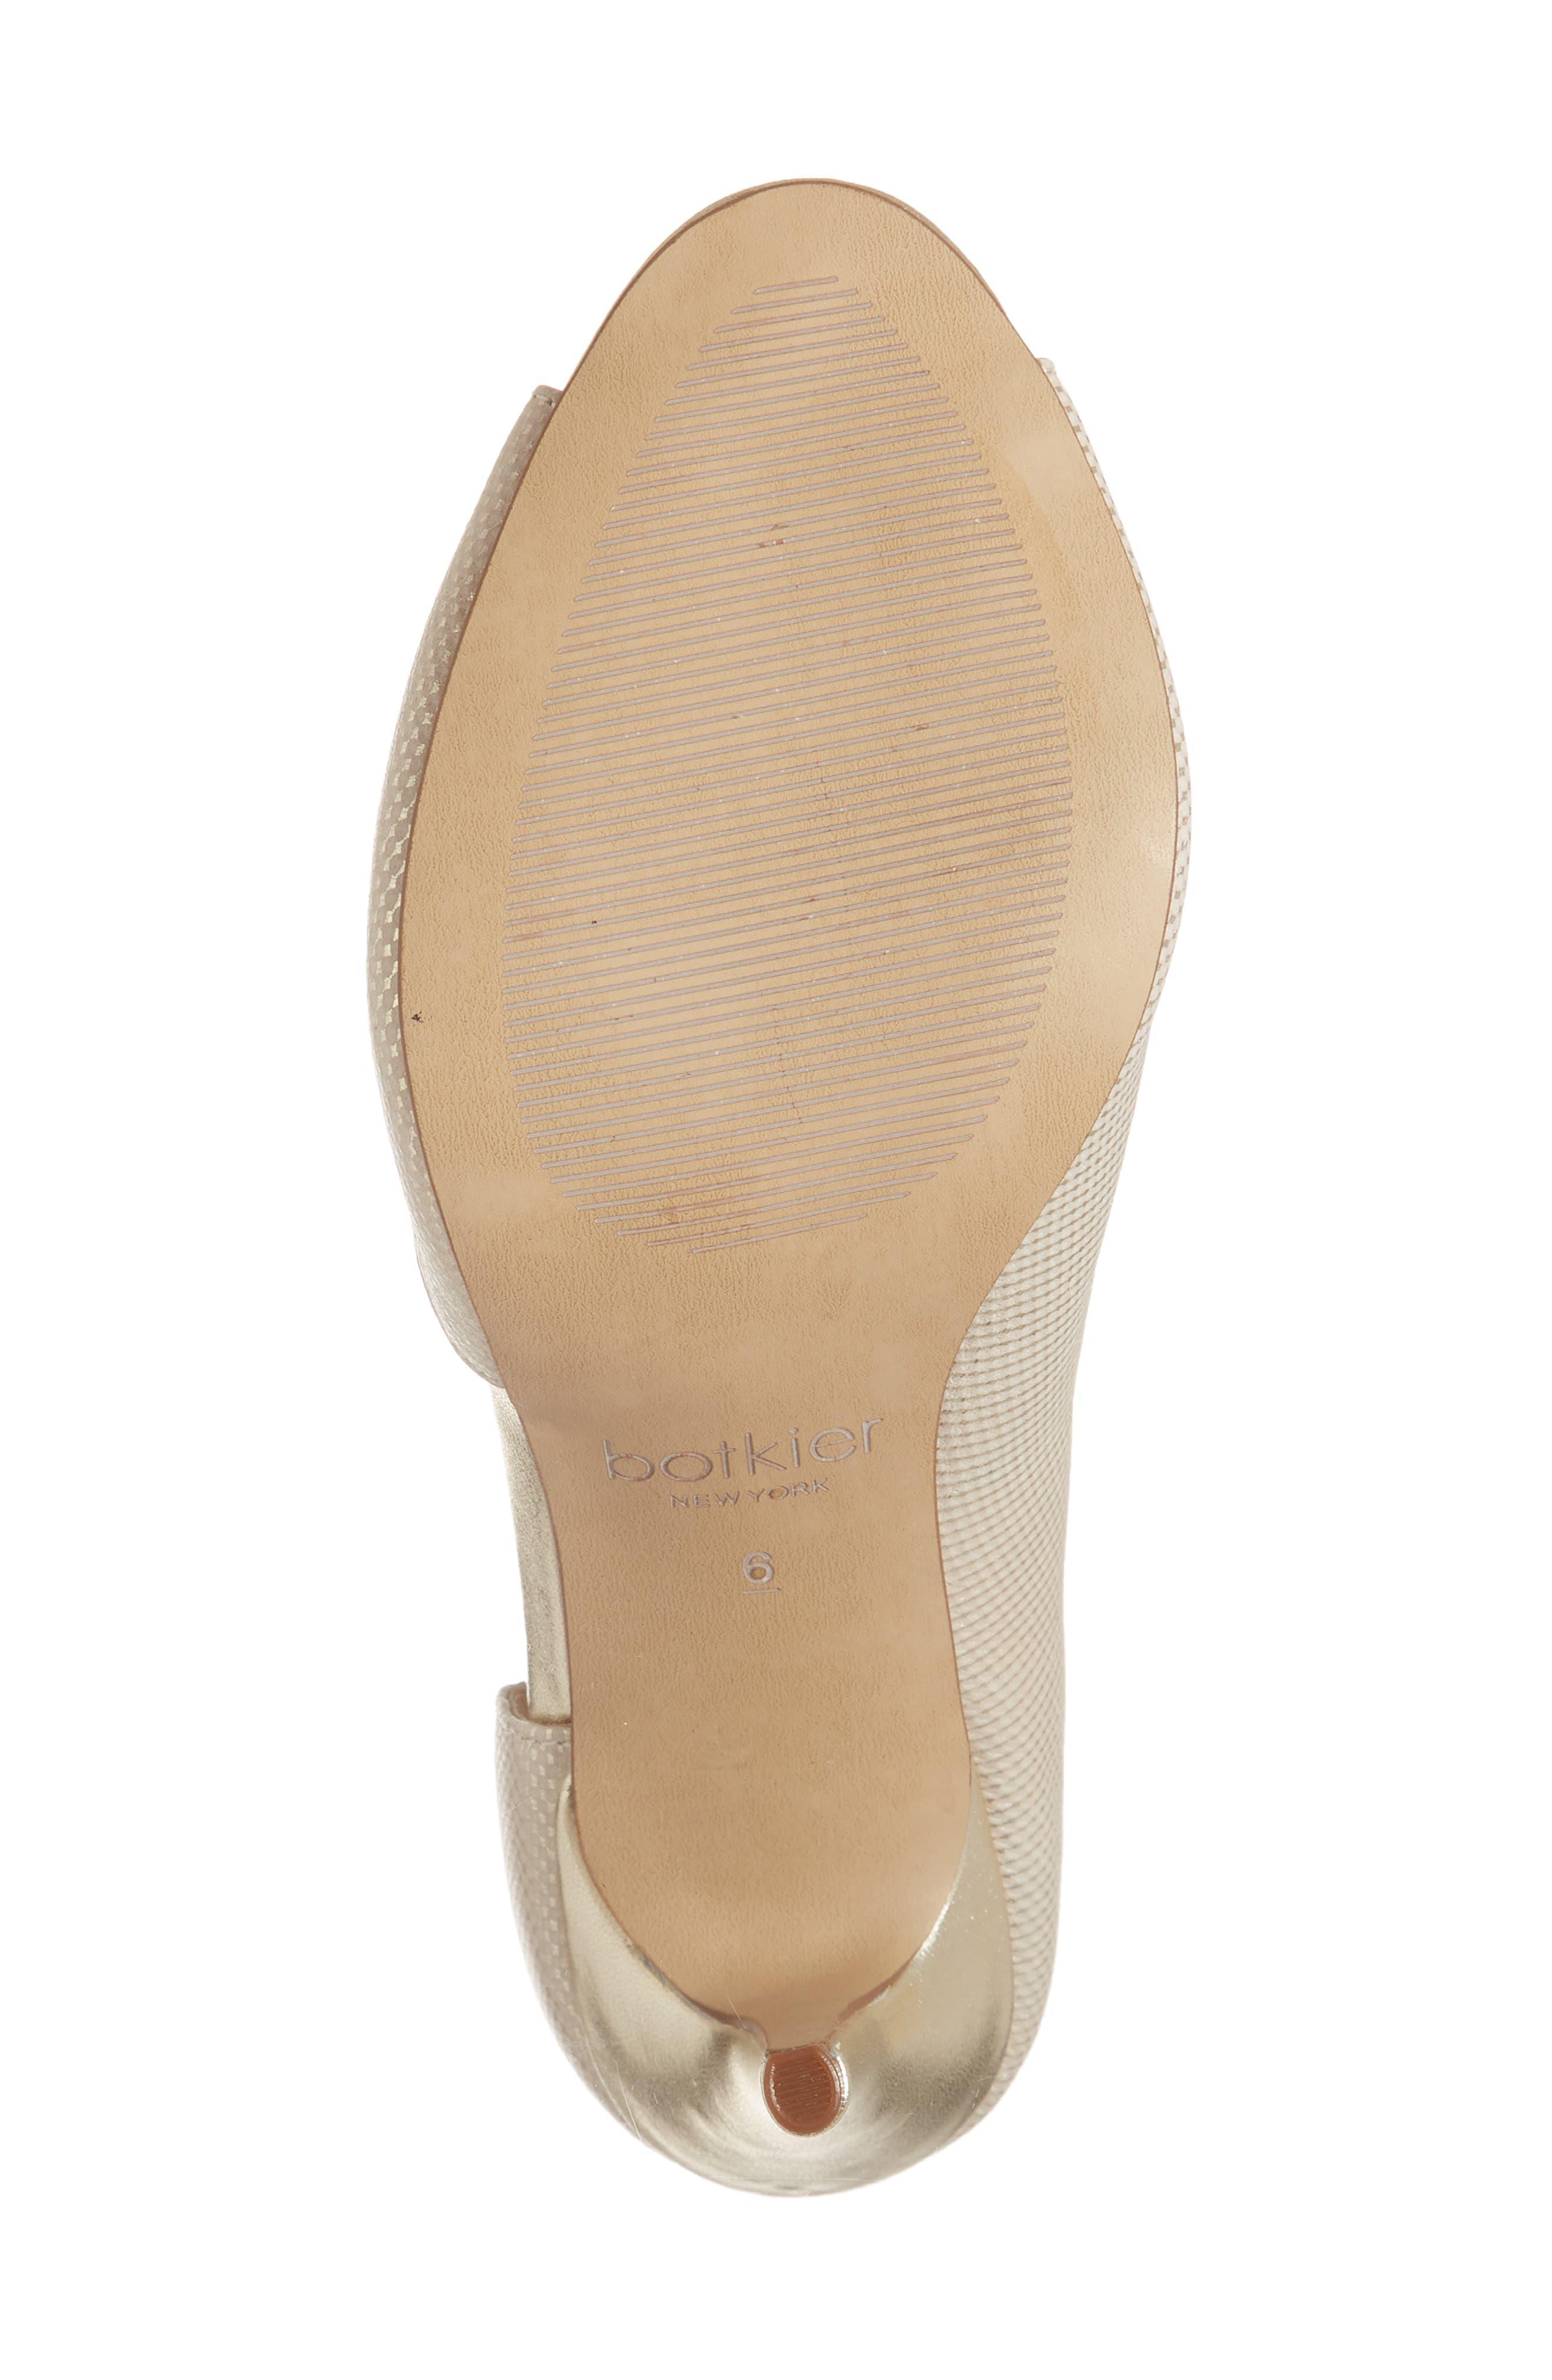 Adelia Asymmetrical Sandal,                             Alternate thumbnail 6, color,                             Gold Shimmer Fabric